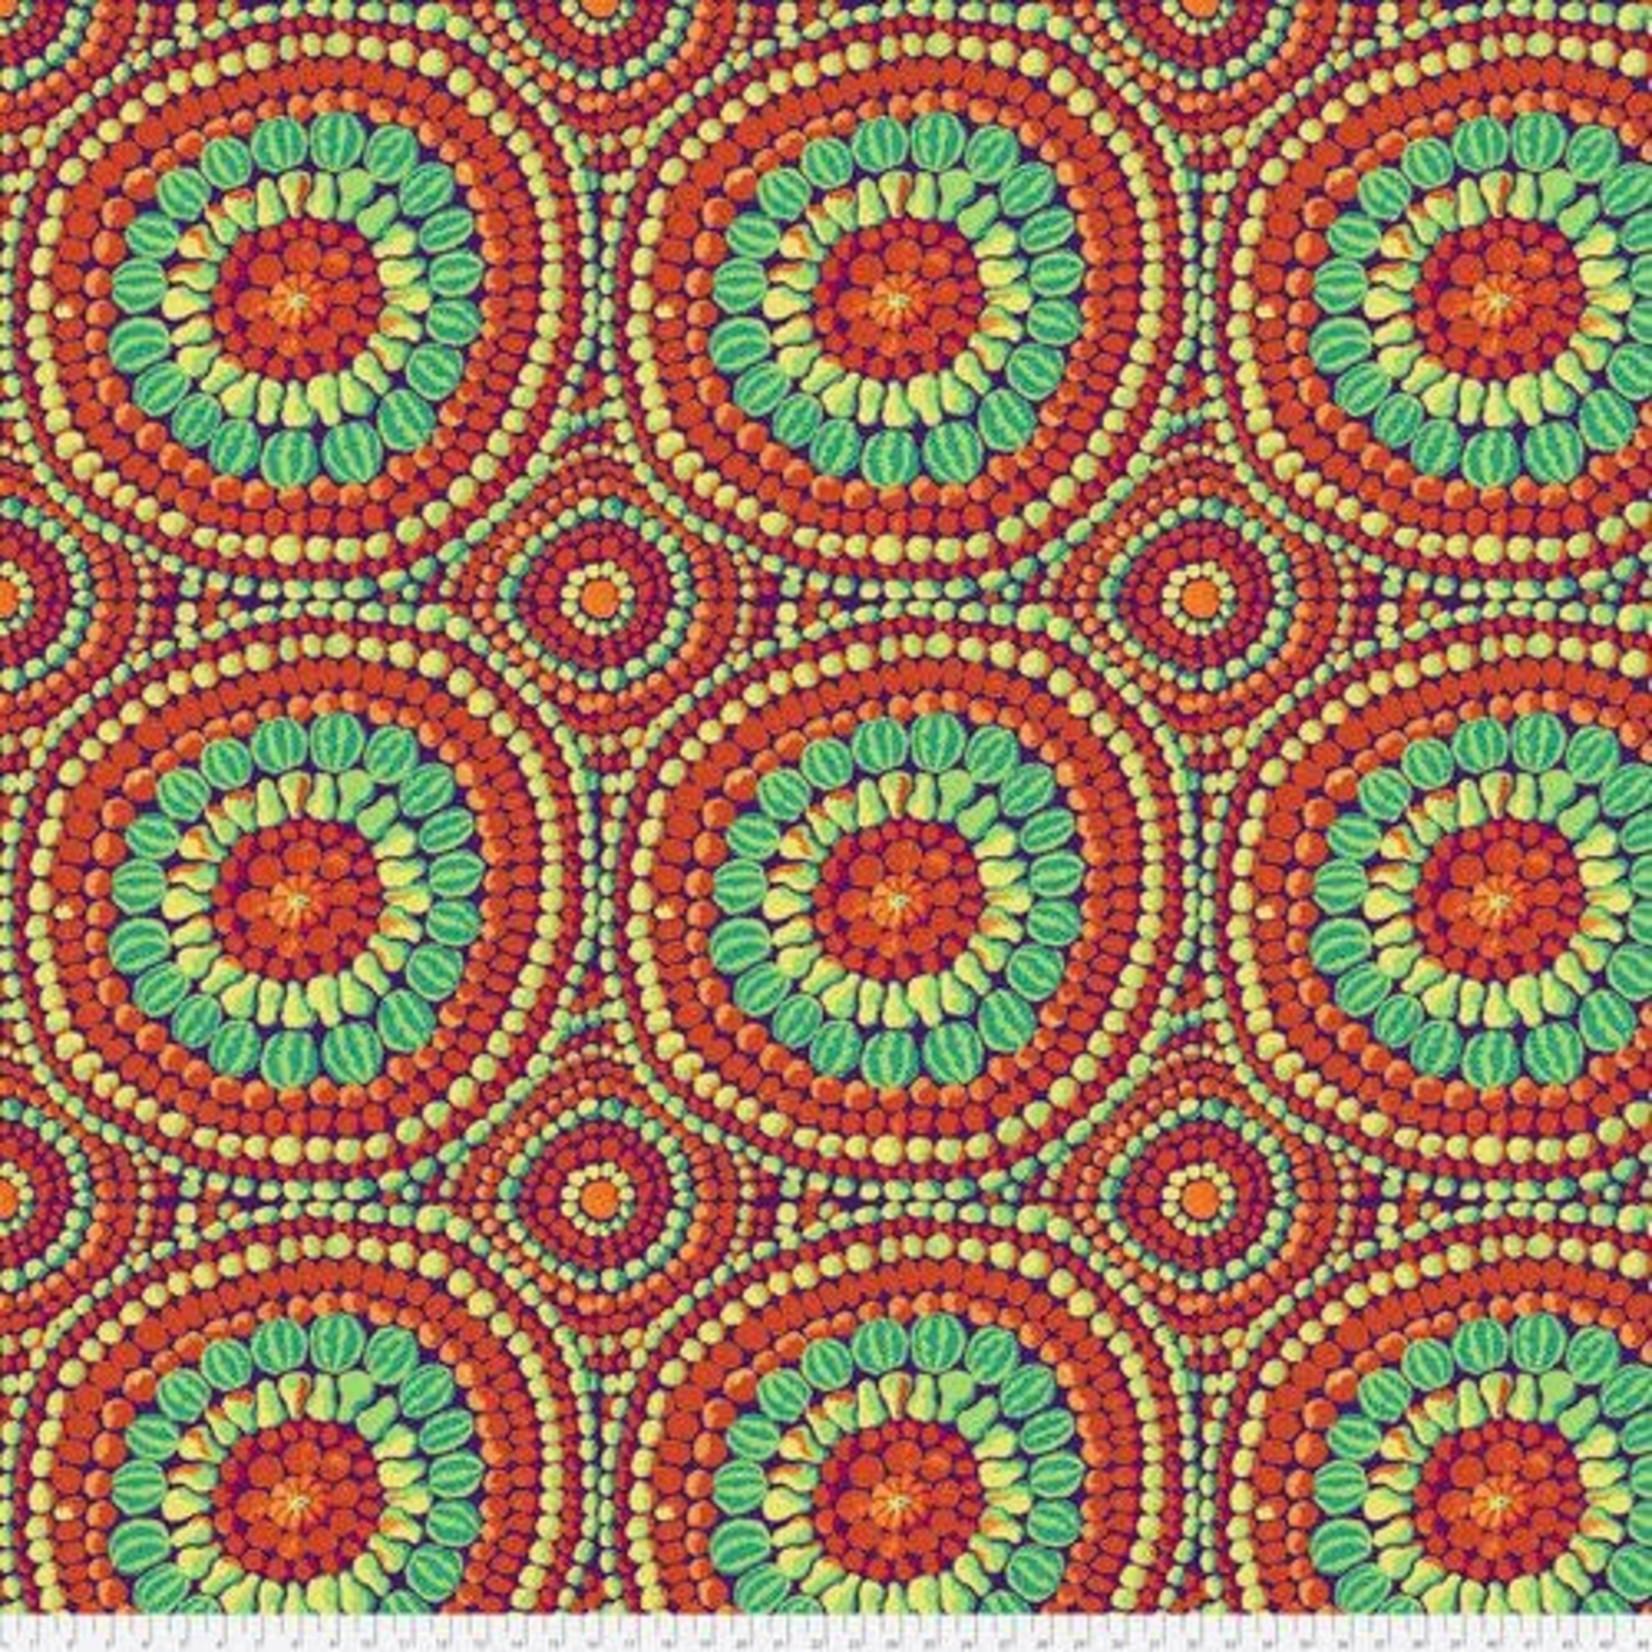 FreeSpirit Fabrics Mandela - Red